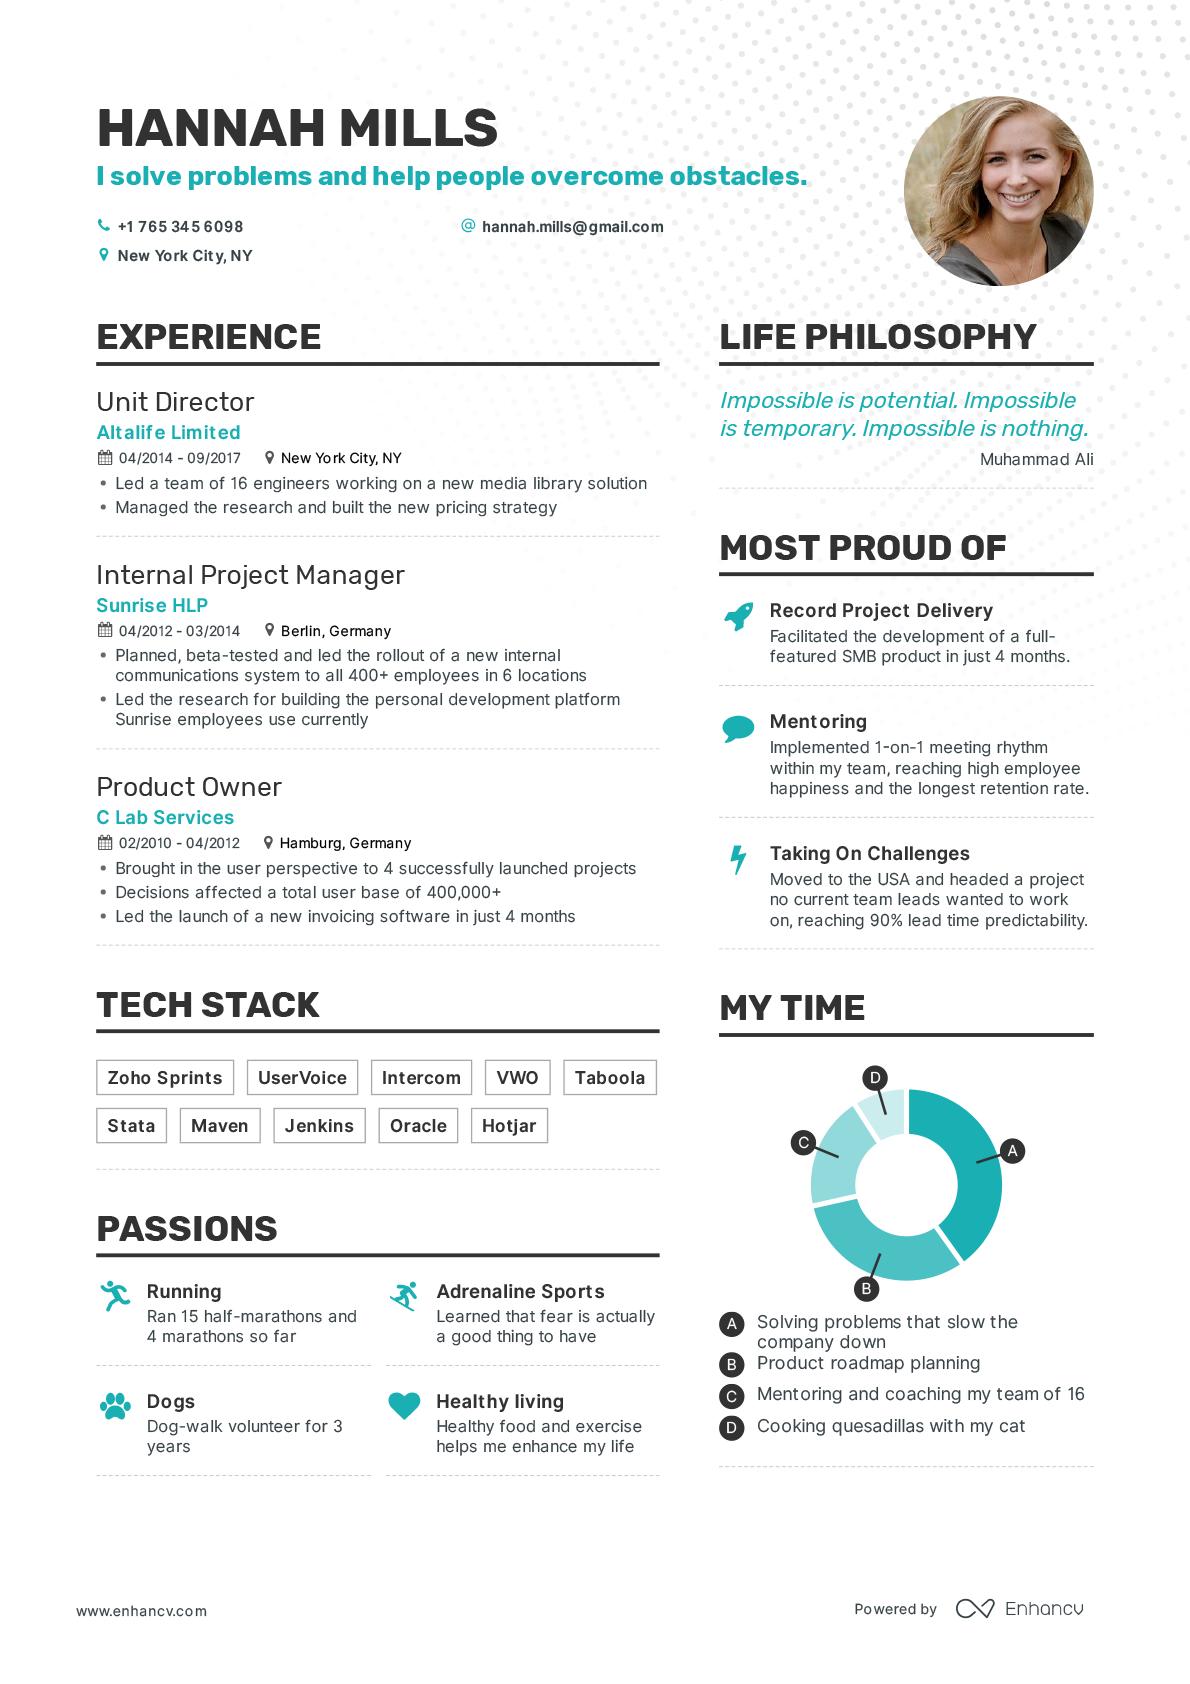 Enhancv resume builder - Resume examples